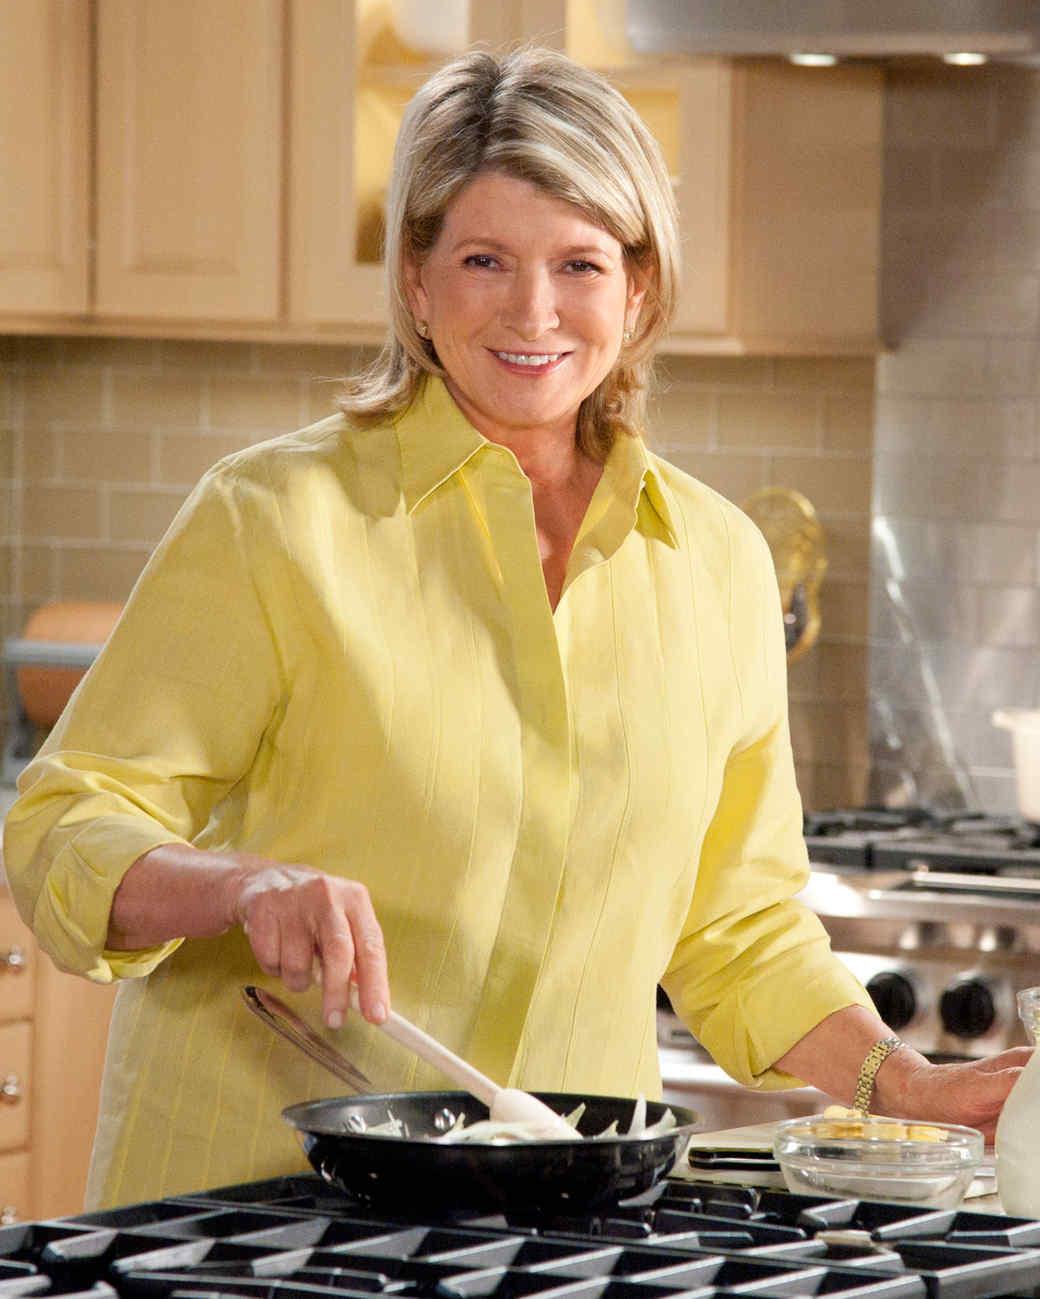 martha_stewarts_cooking_school_preview_2.jpg